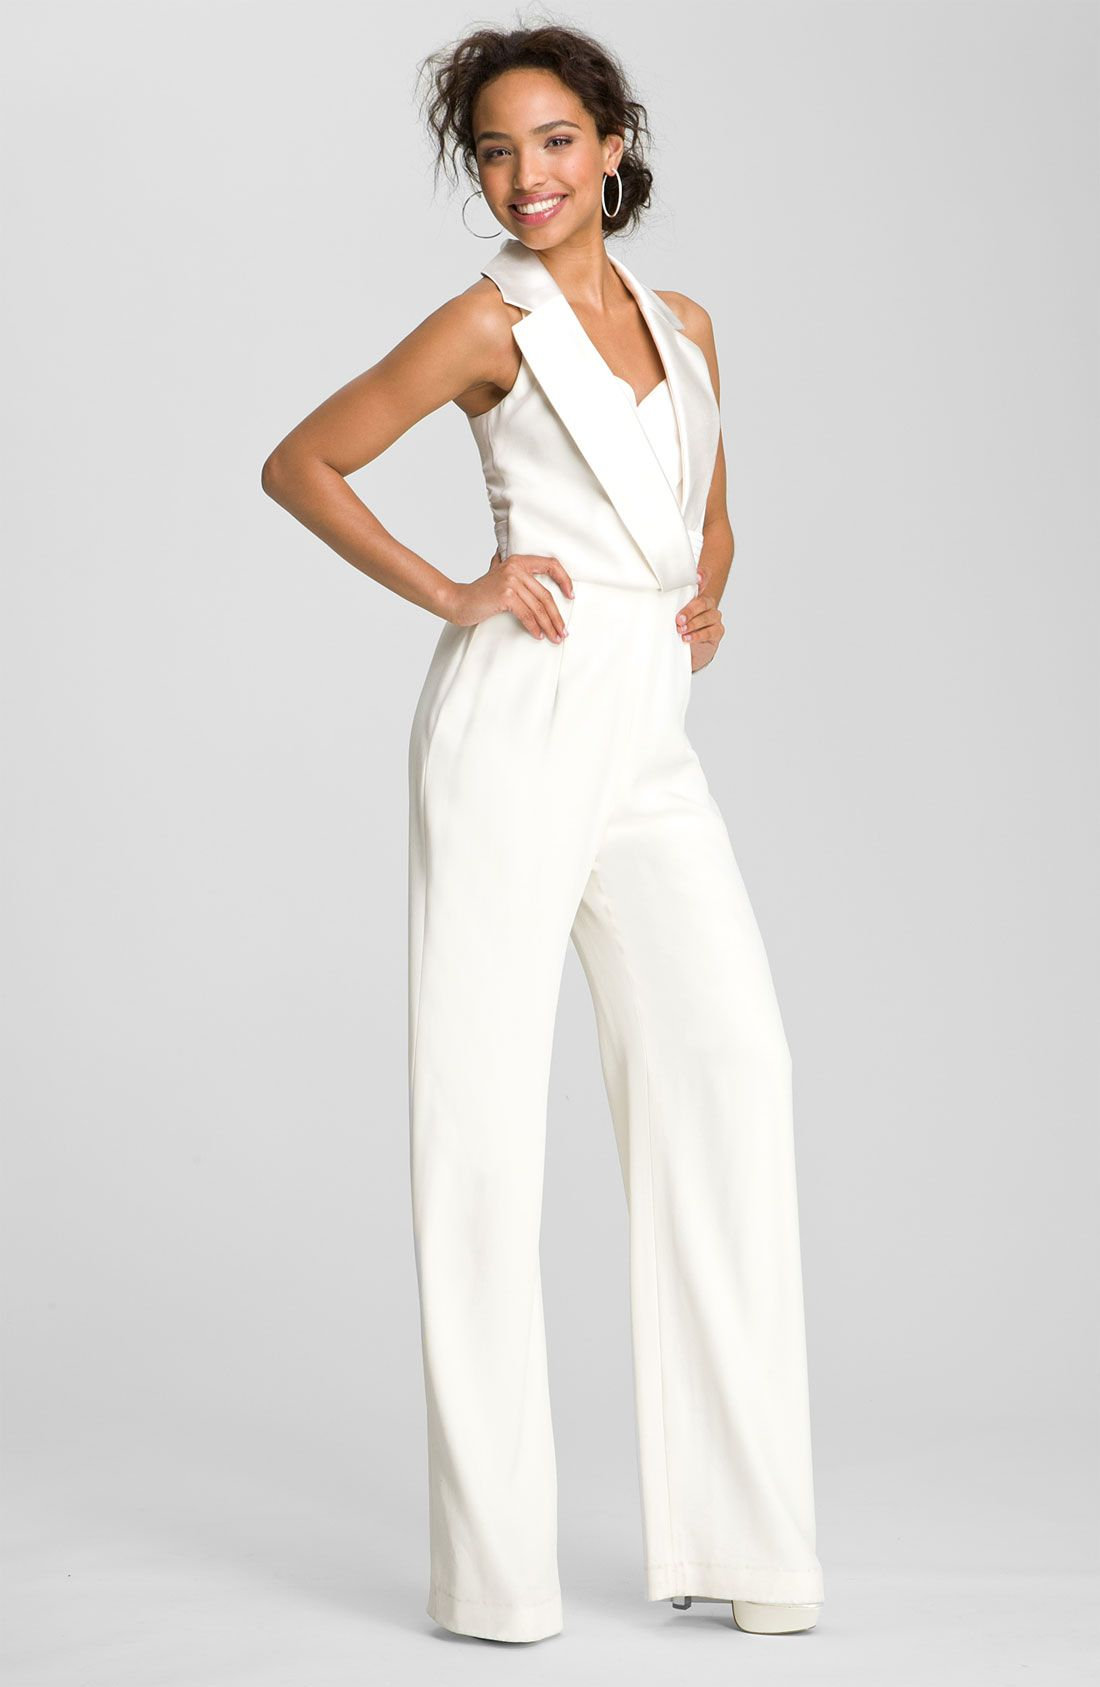 Women+Dress+Jumpsuits | Bride Party Dress – Theia Tuxedo Style ...